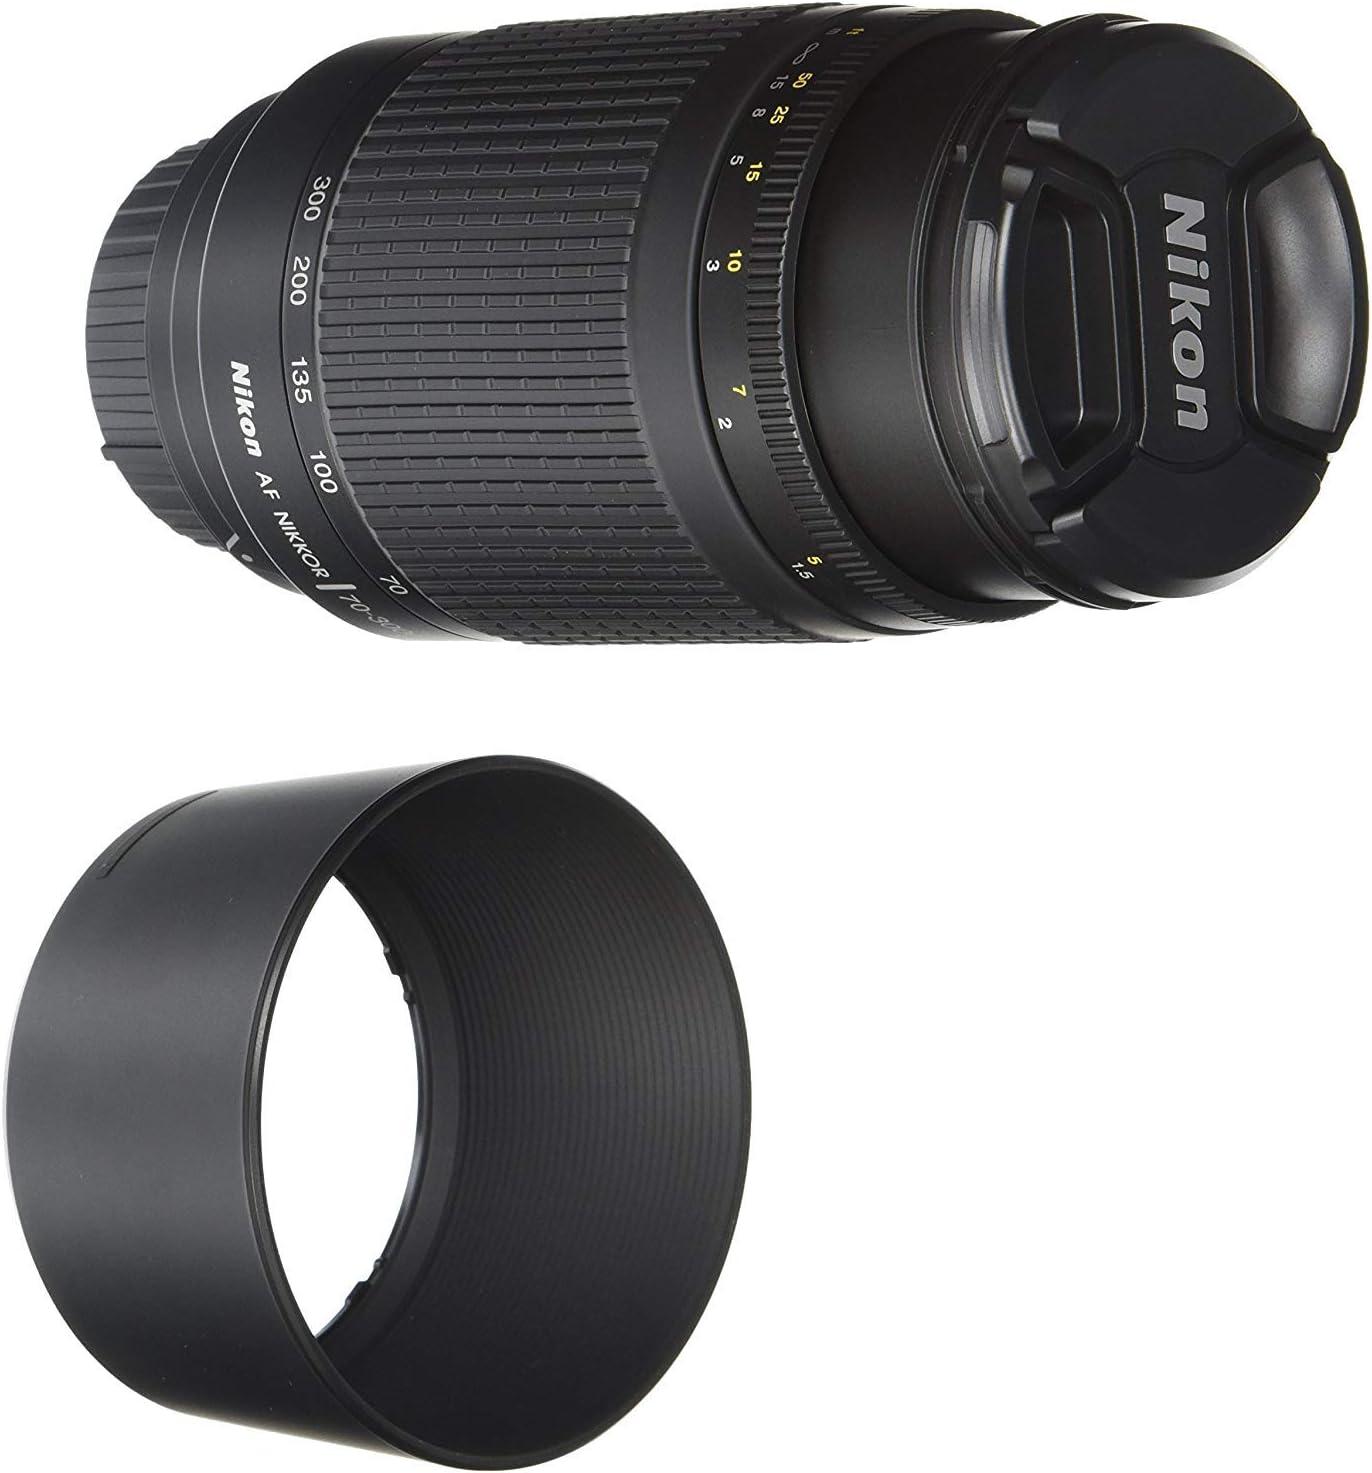 Nikon 70 300 Mm F 4 5 6 G Zoom Objektiv Mit Autofokus Kamera